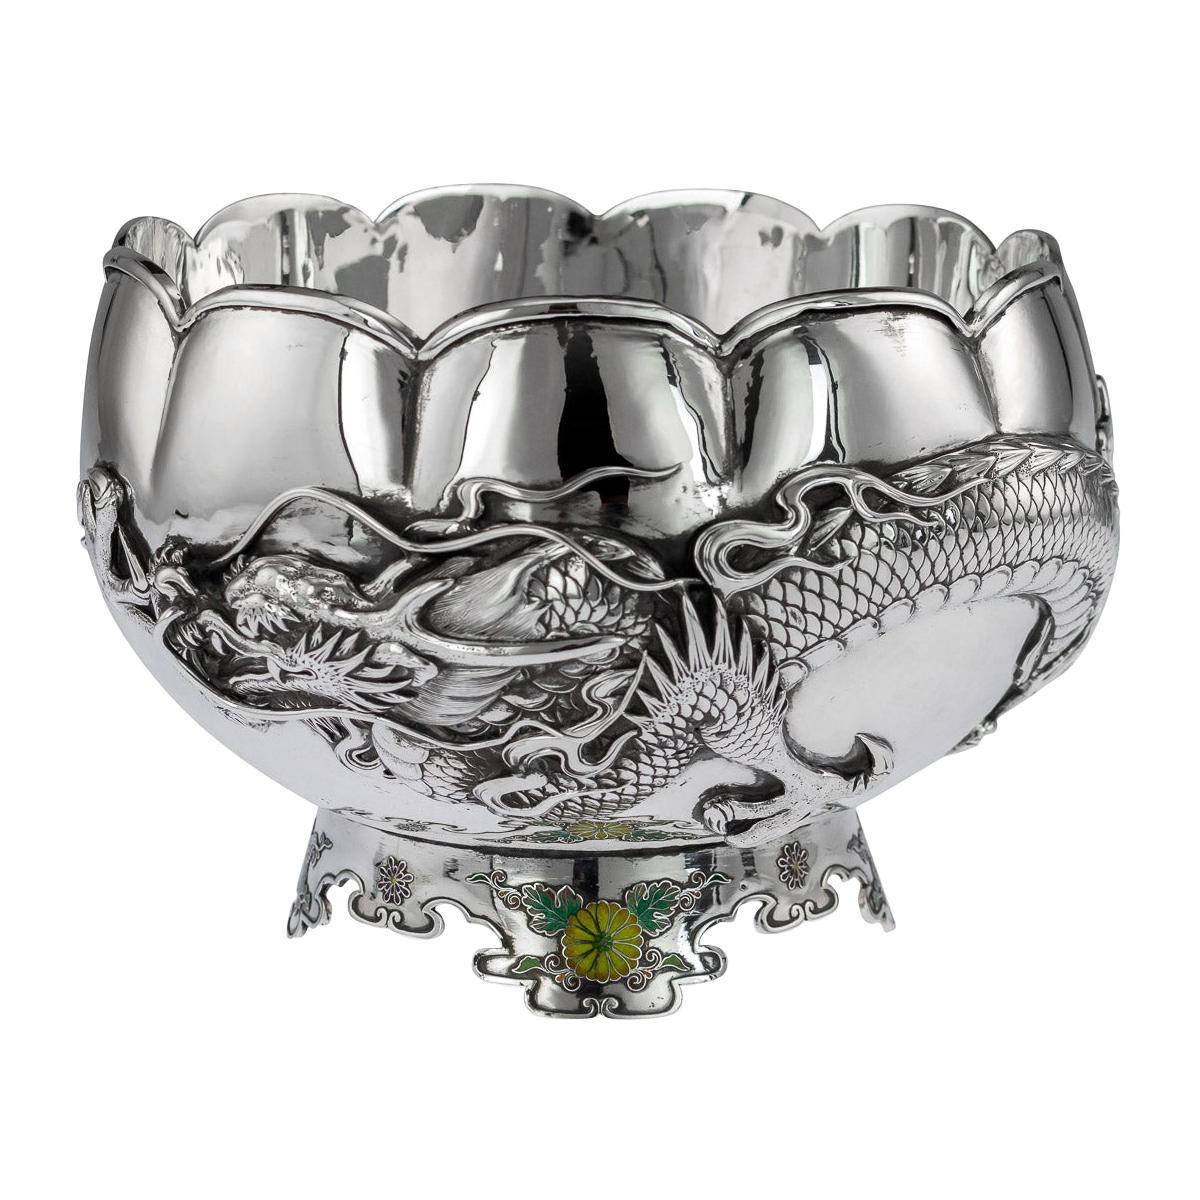 19thc Japanese Meiji Period Solid Silver & Enamel Dragon Bowl, C.1890